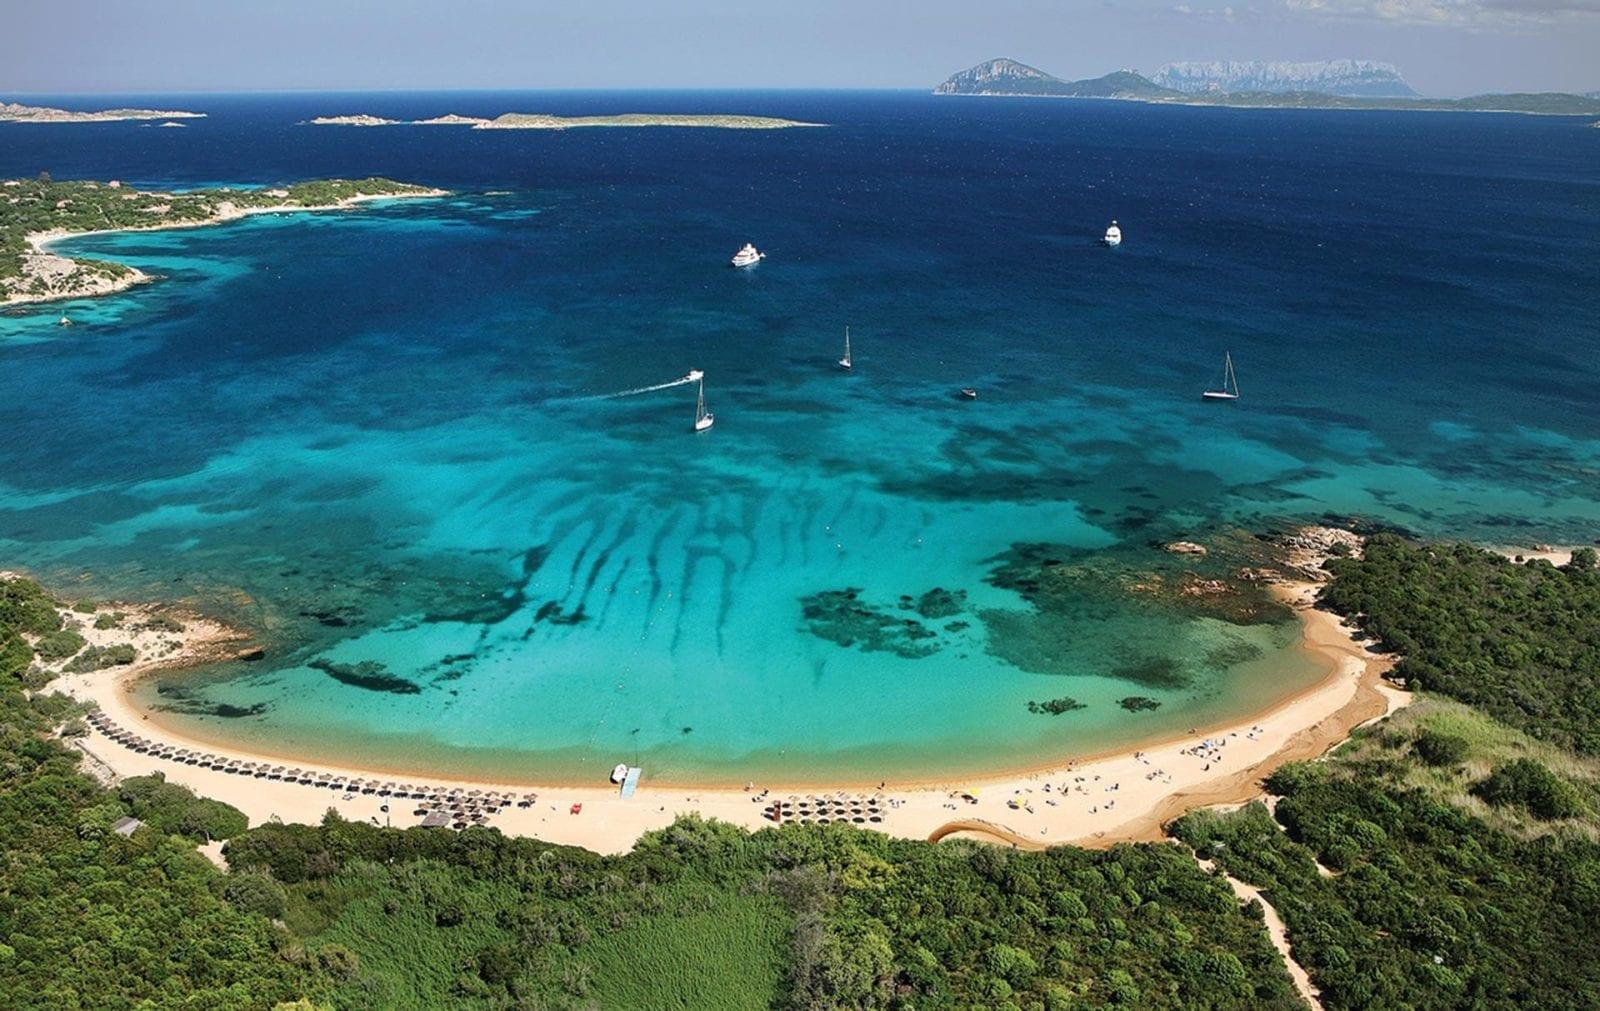 Costa smeralda yacht silver star yachting for Arredi costa smeralda